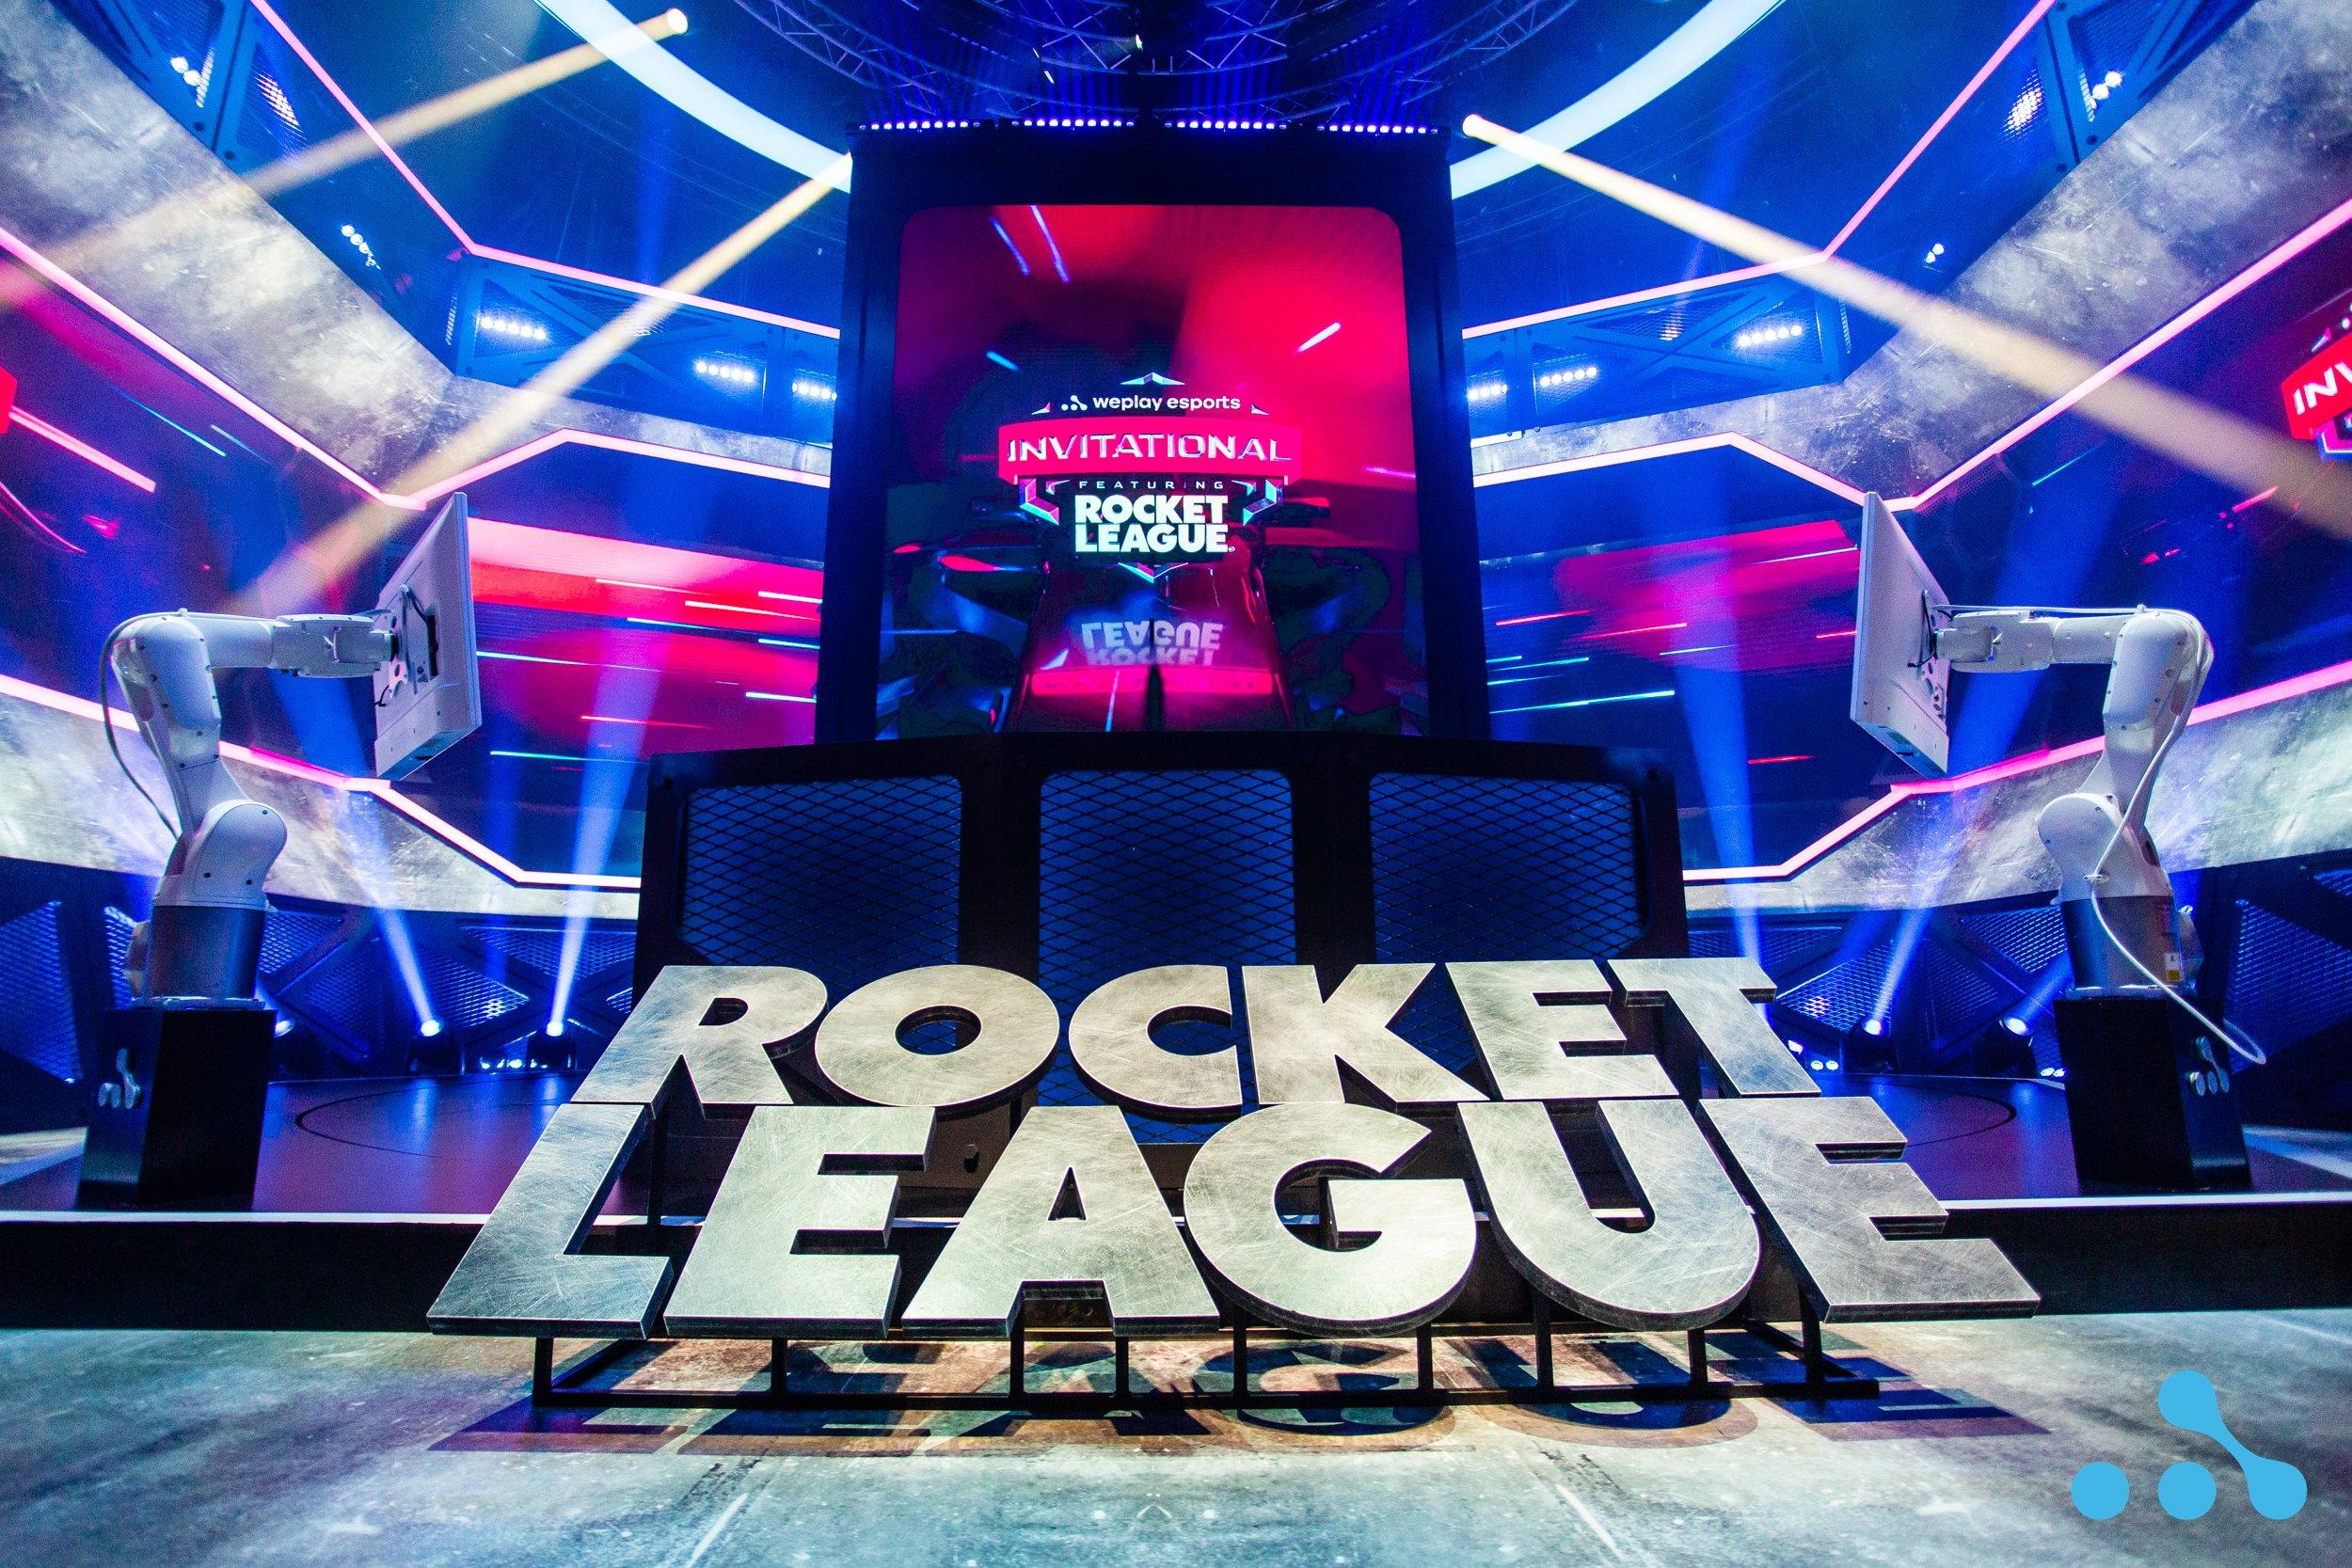 WePlay Esports Invitational featuring Rocket League. Photo: WePlay Holding